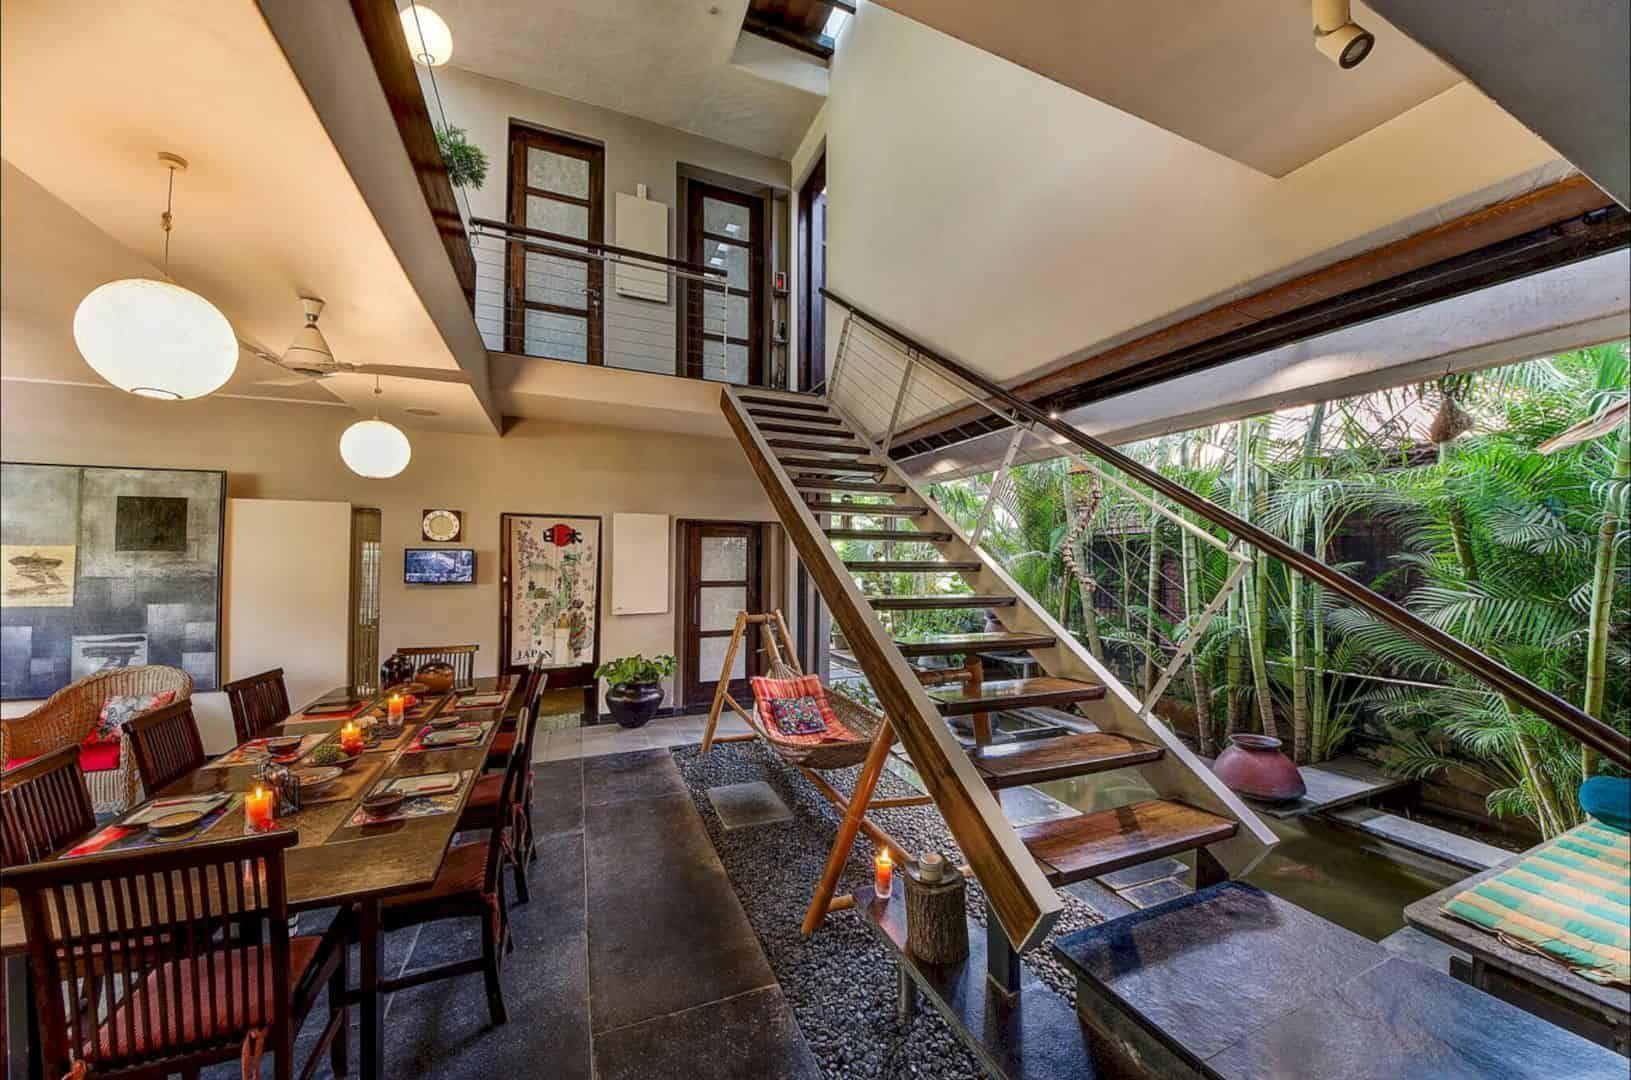 Shunyam, Pune An Urban Oasis with Natural Elements and